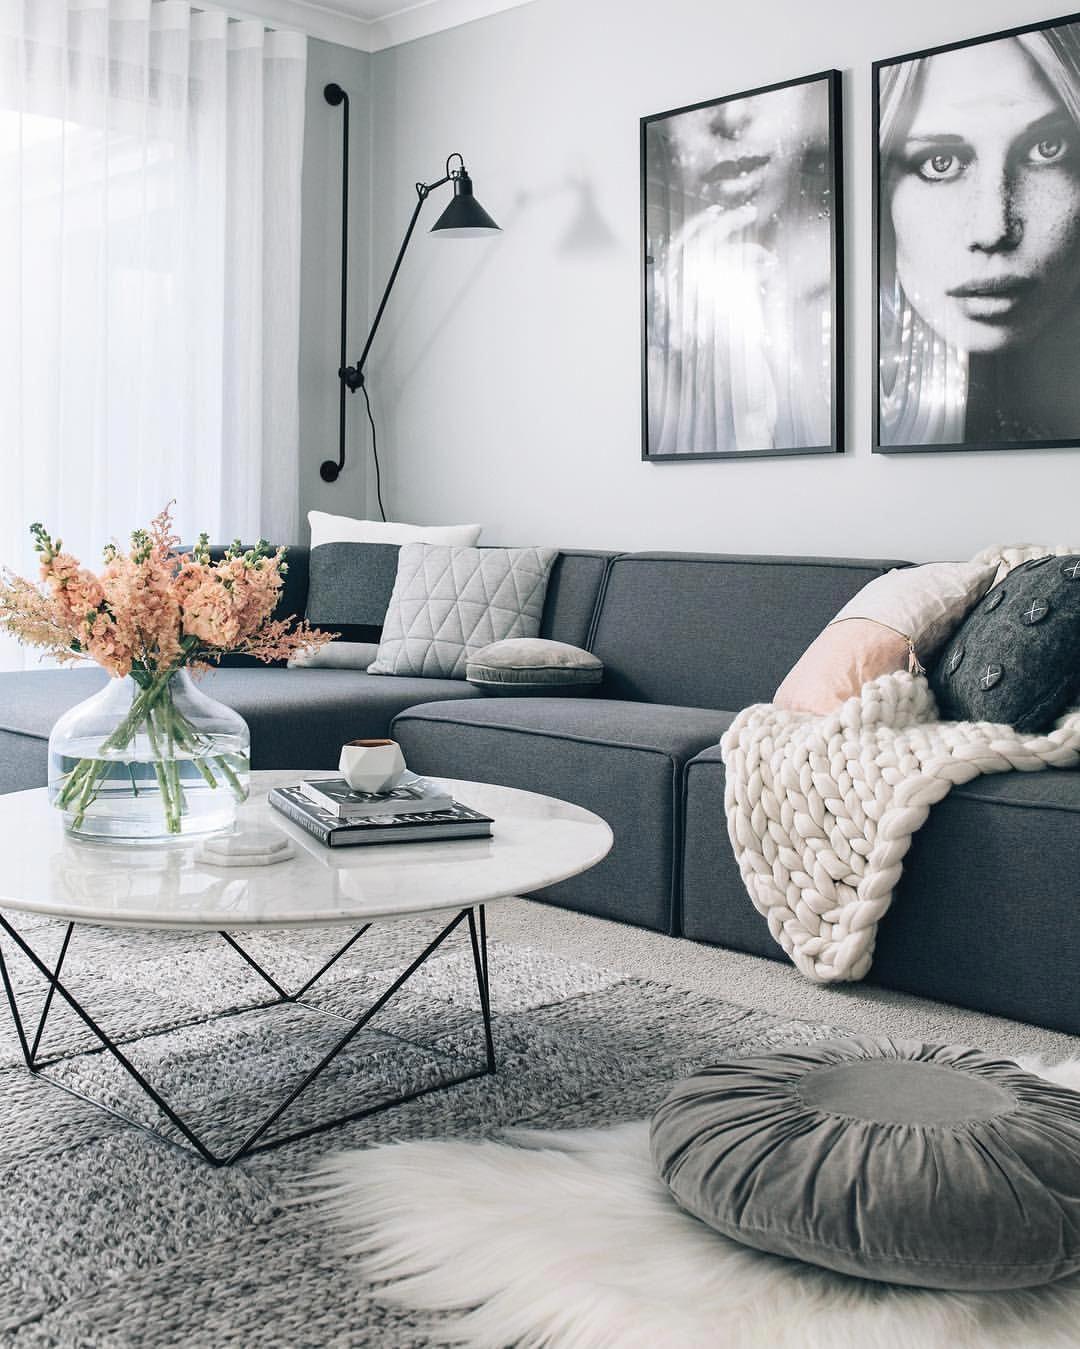 Scandinavian Interior Modern Design Interior Design Christmas Wardrobe Fashion Kitchen Bedroom Living Room Sty Living Room Designs Living Decor Home Decor #wardrobe #in #the #living #room